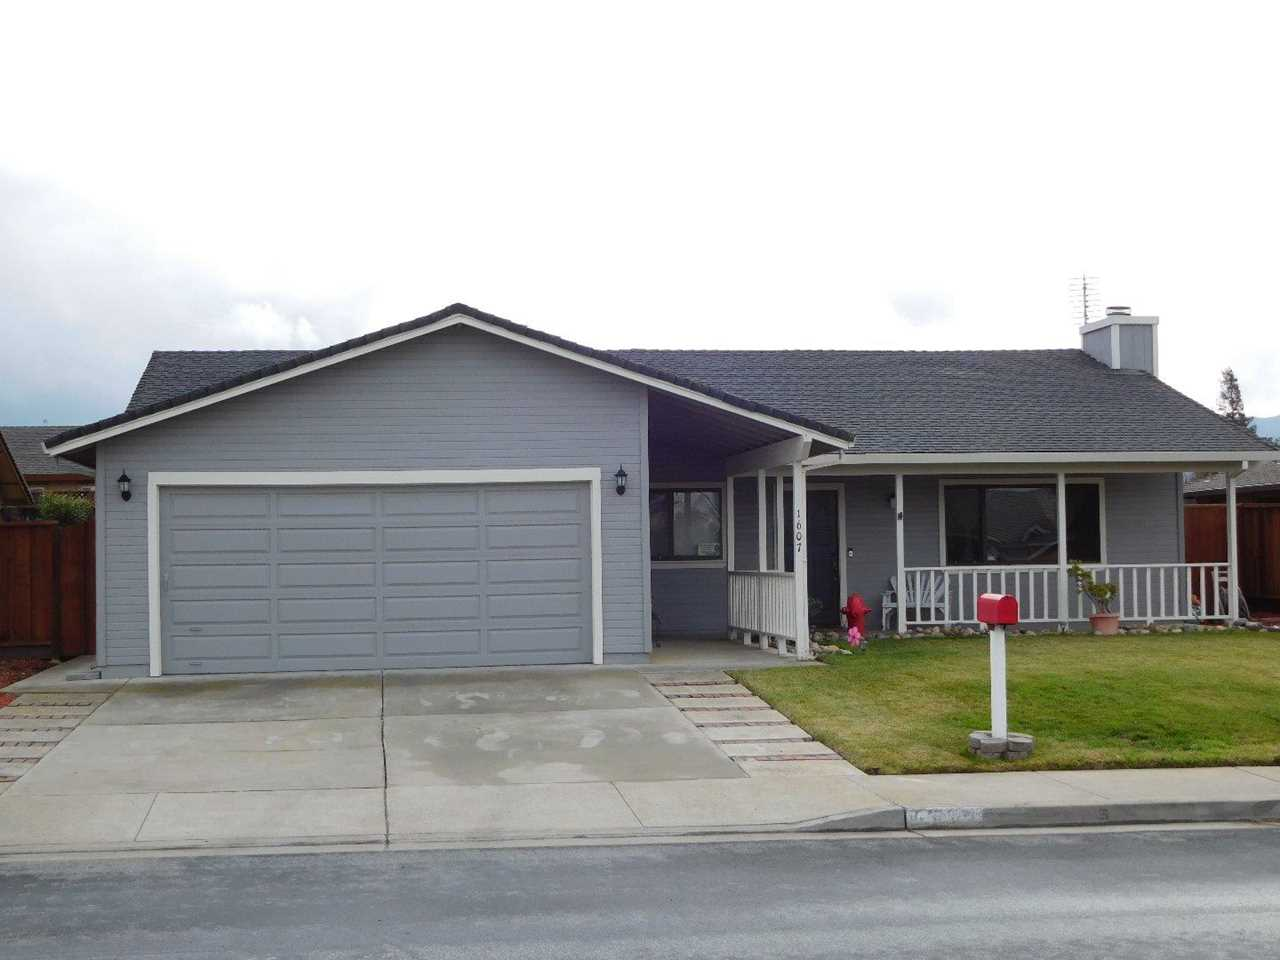 1607 Bodega Ct Hollister, CA 95023 | MLS ML81734949 Photo 1